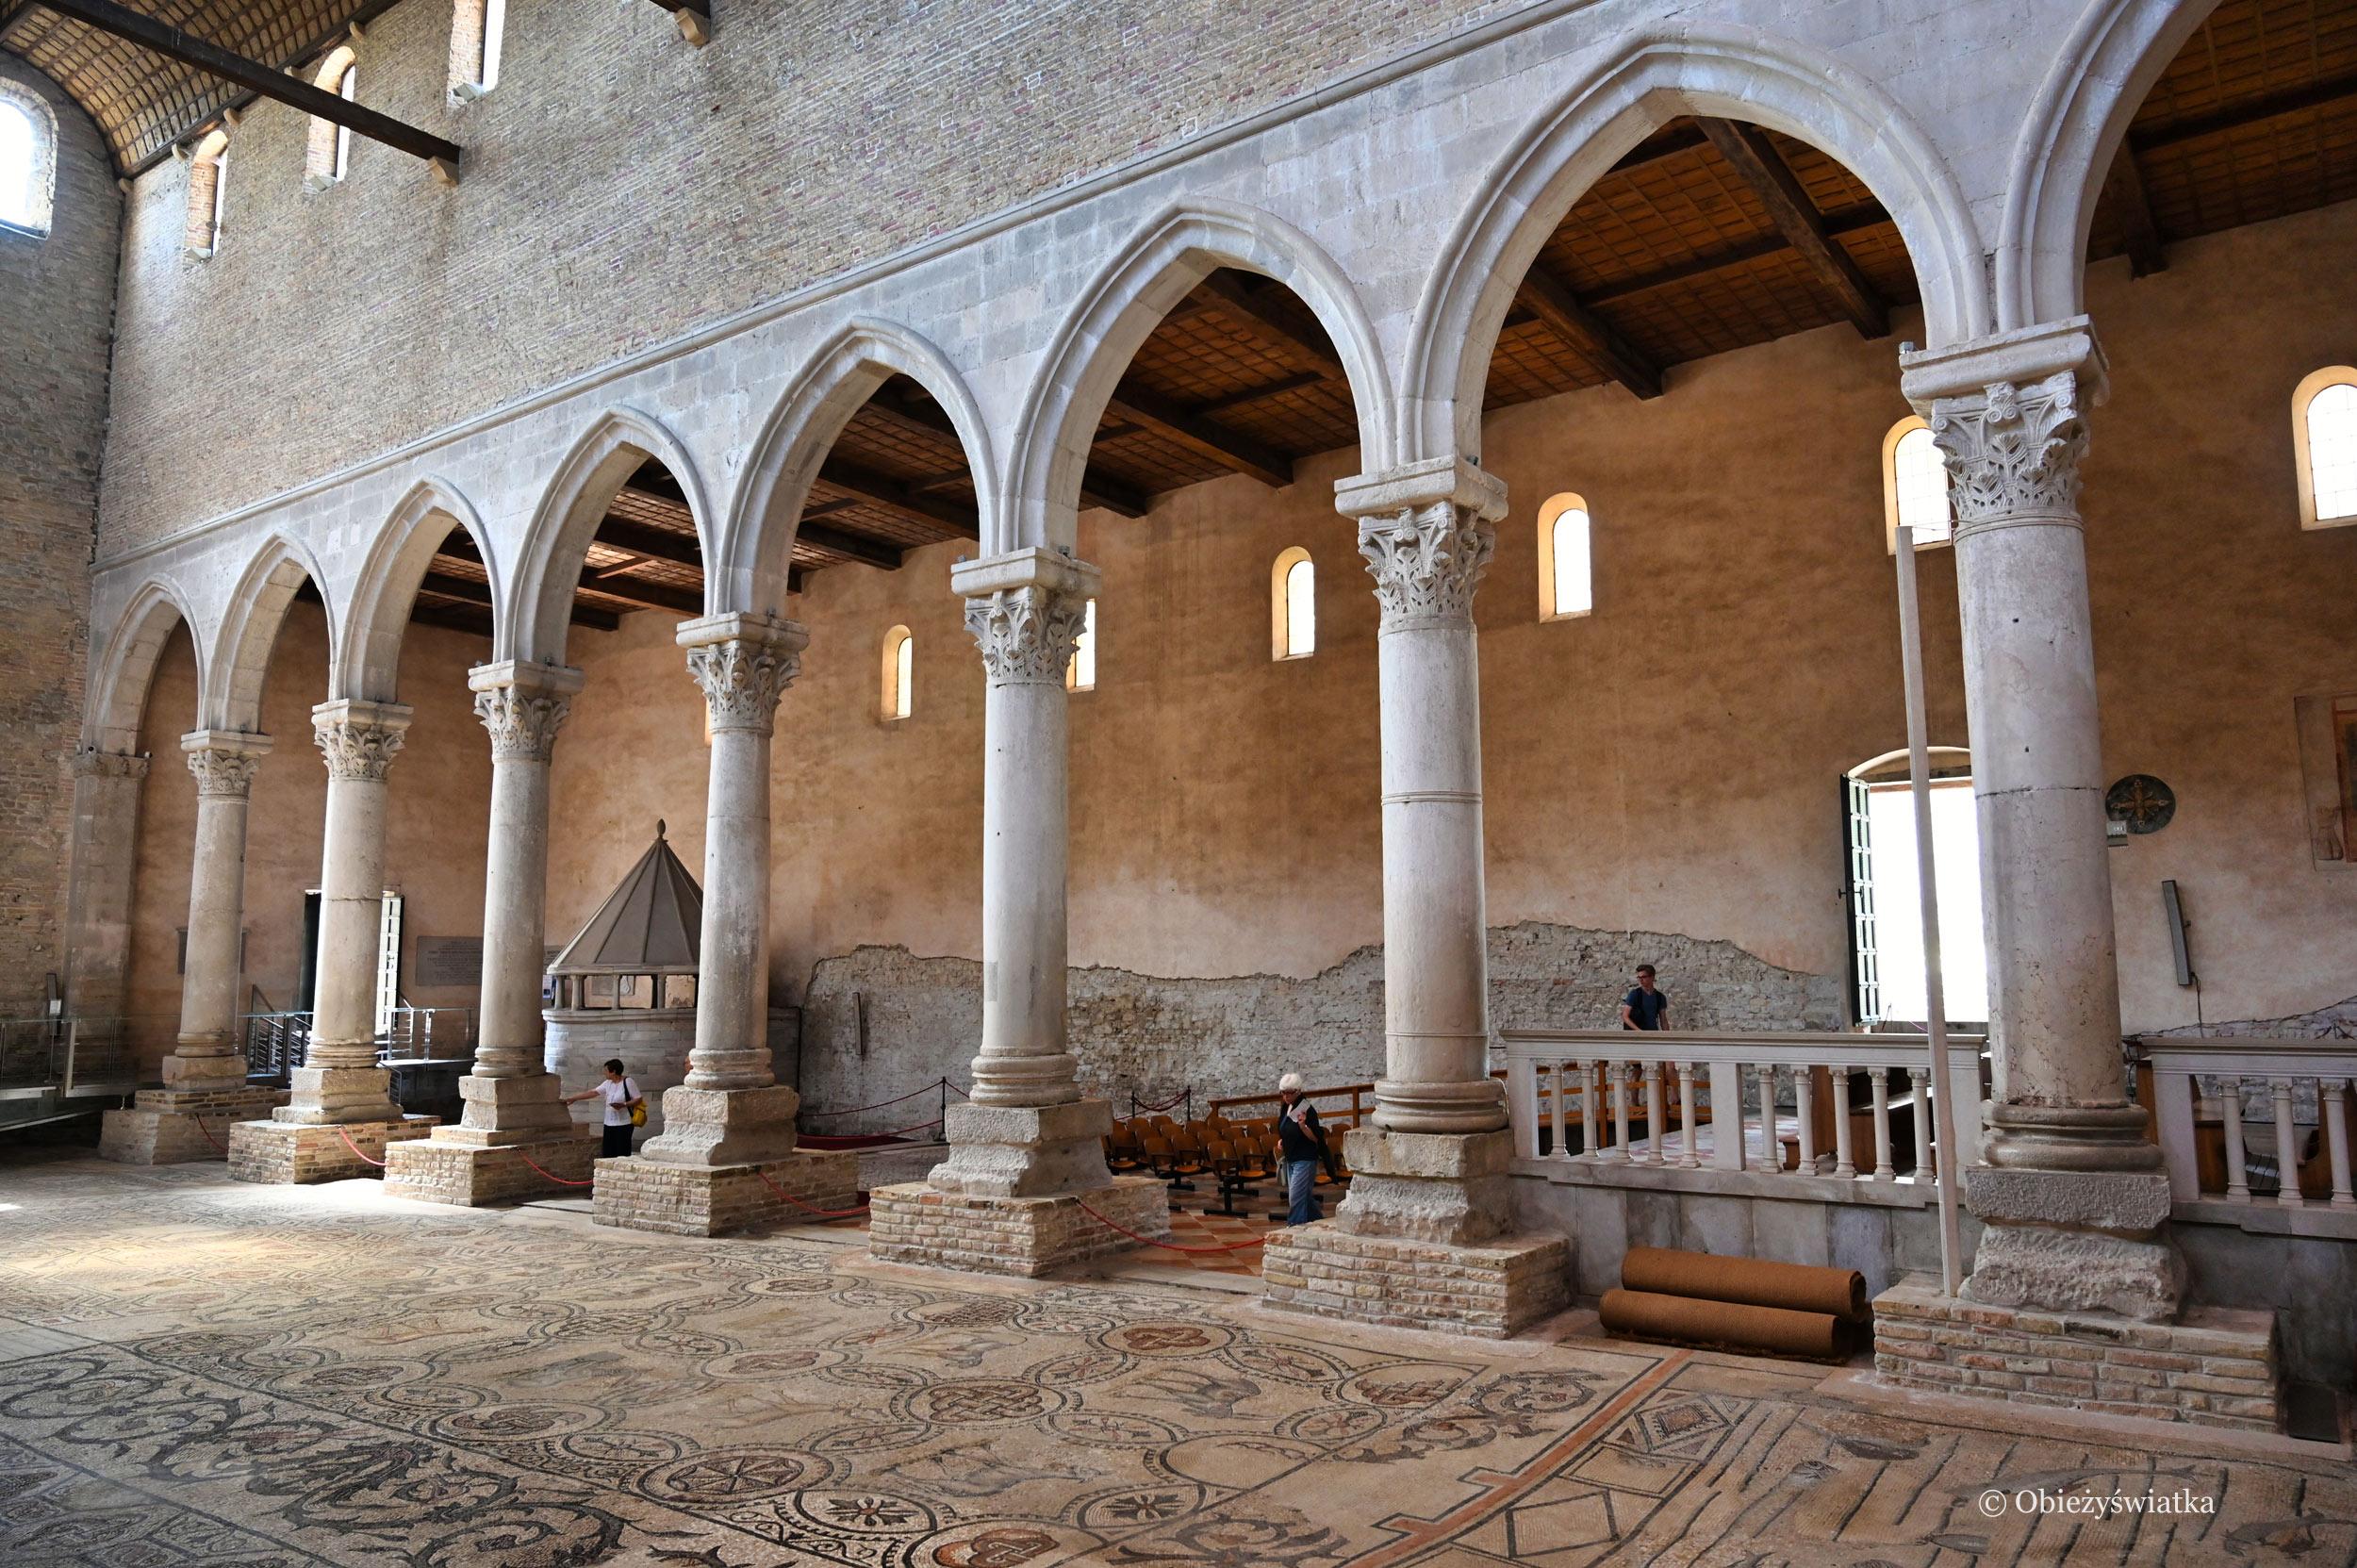 Kolumny i fragment zabytkowej mozaiki - Akwileja